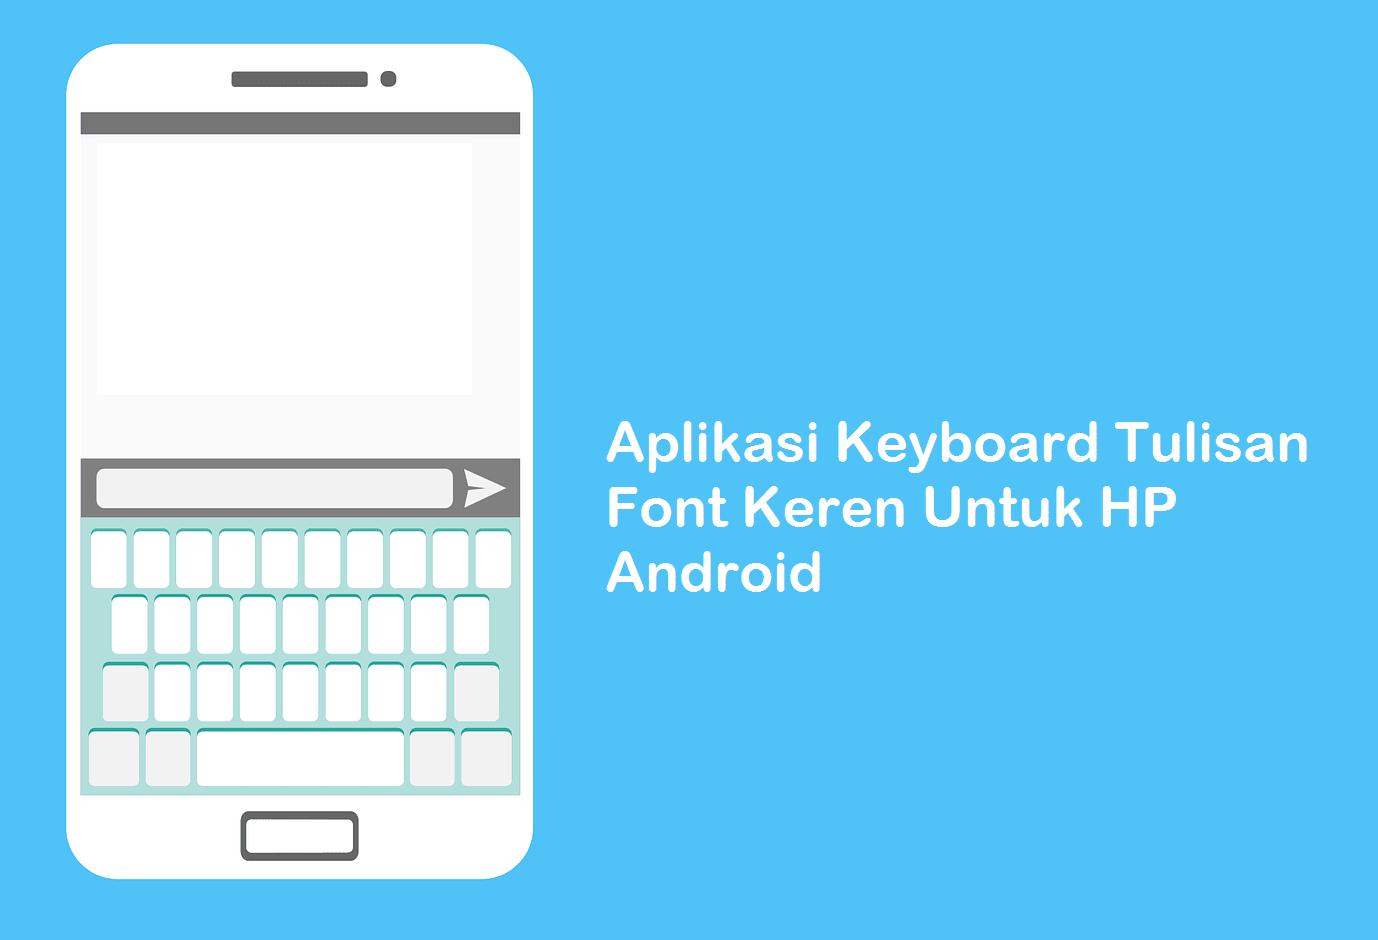 Aplikasi Keyboard Tulisan Keren Di HP